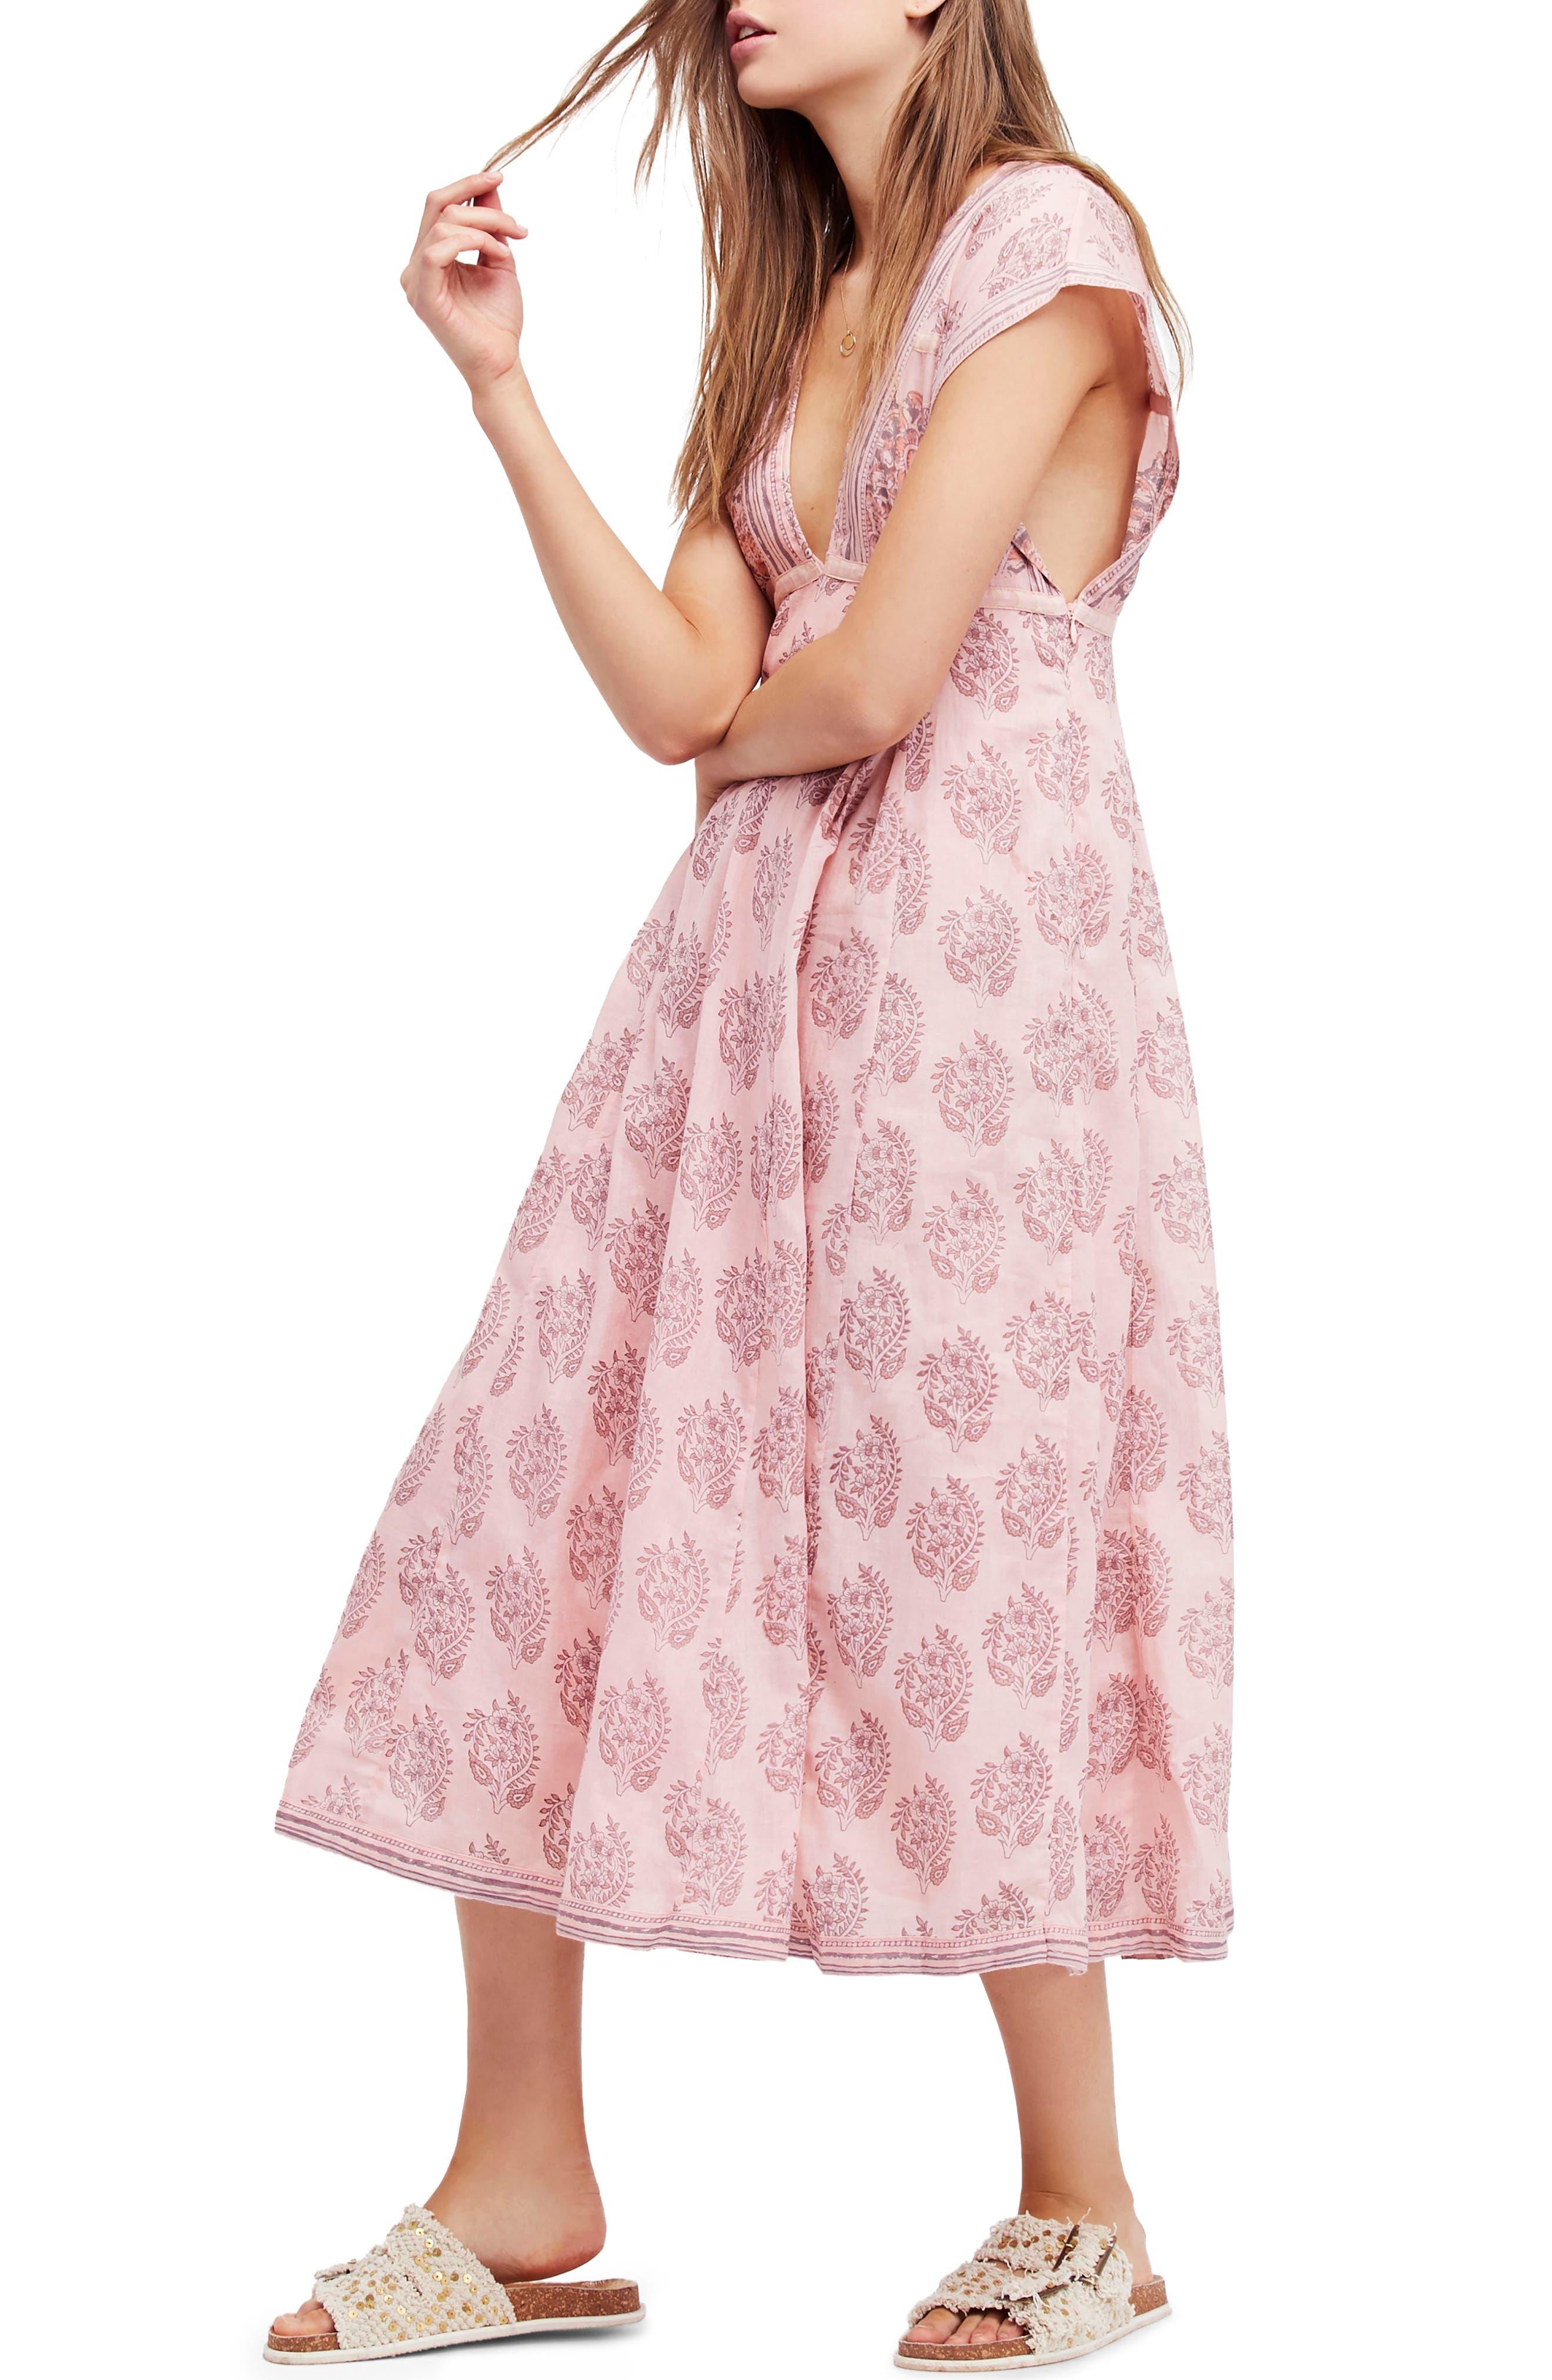 Riakaa Dress,                             Main thumbnail 1, color,                             Pink